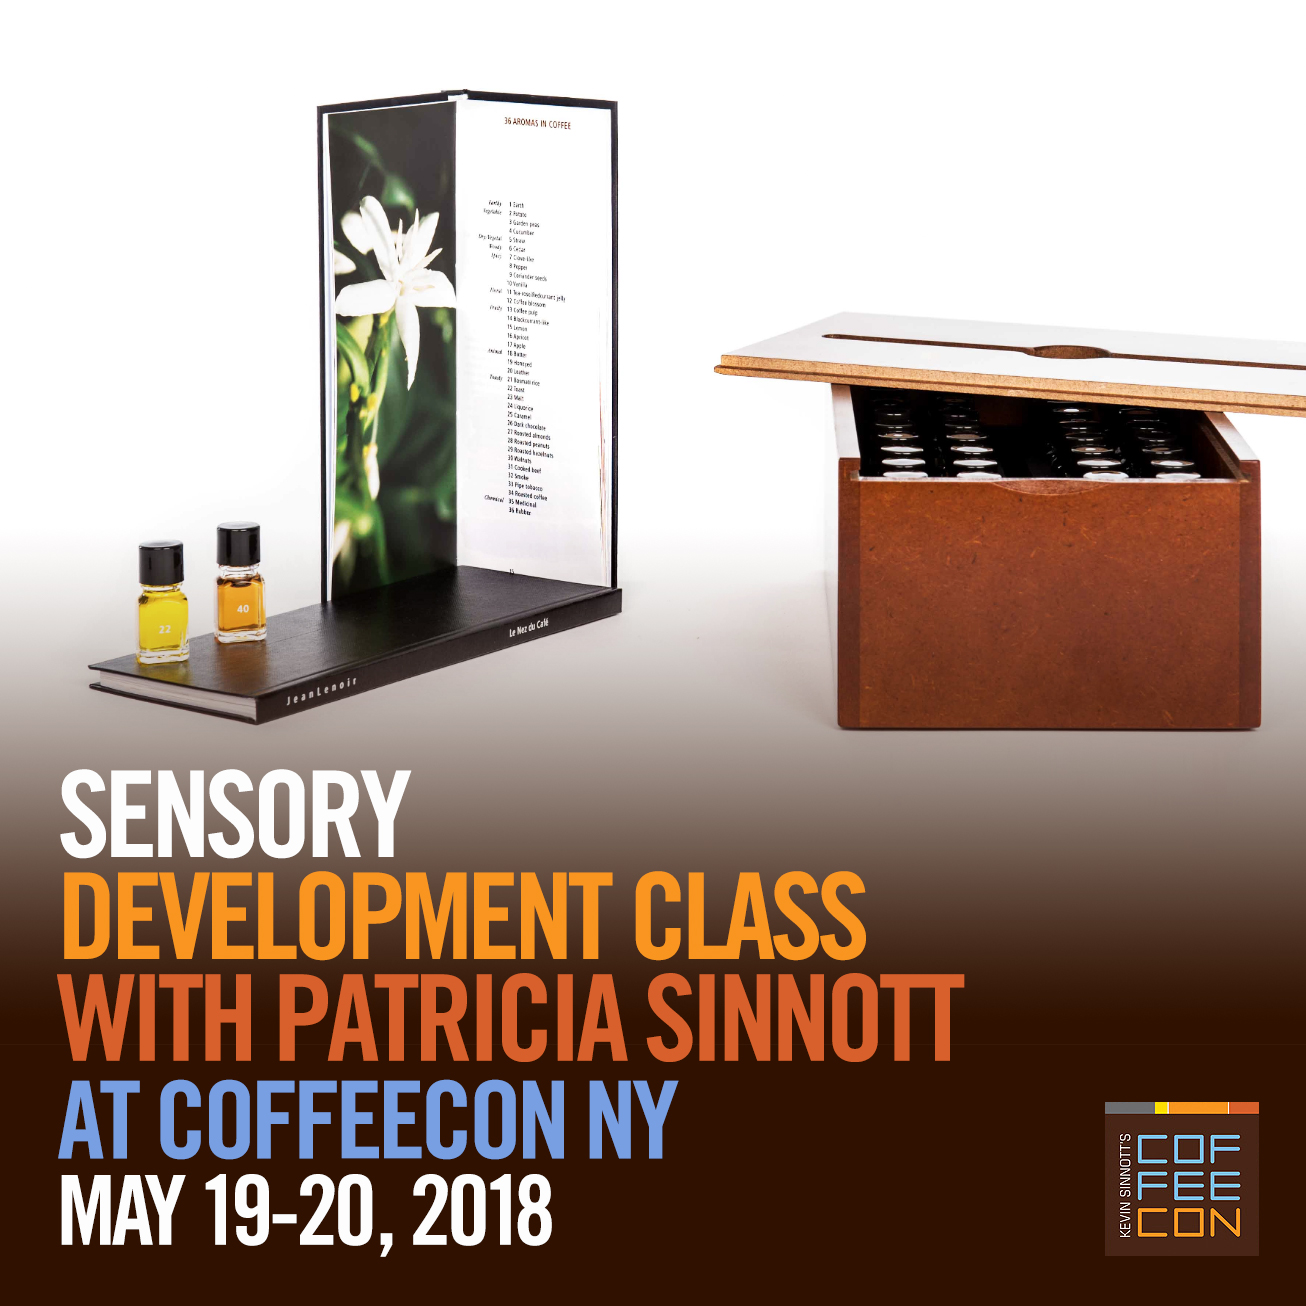 Sensory Development with Patricia Sinnott